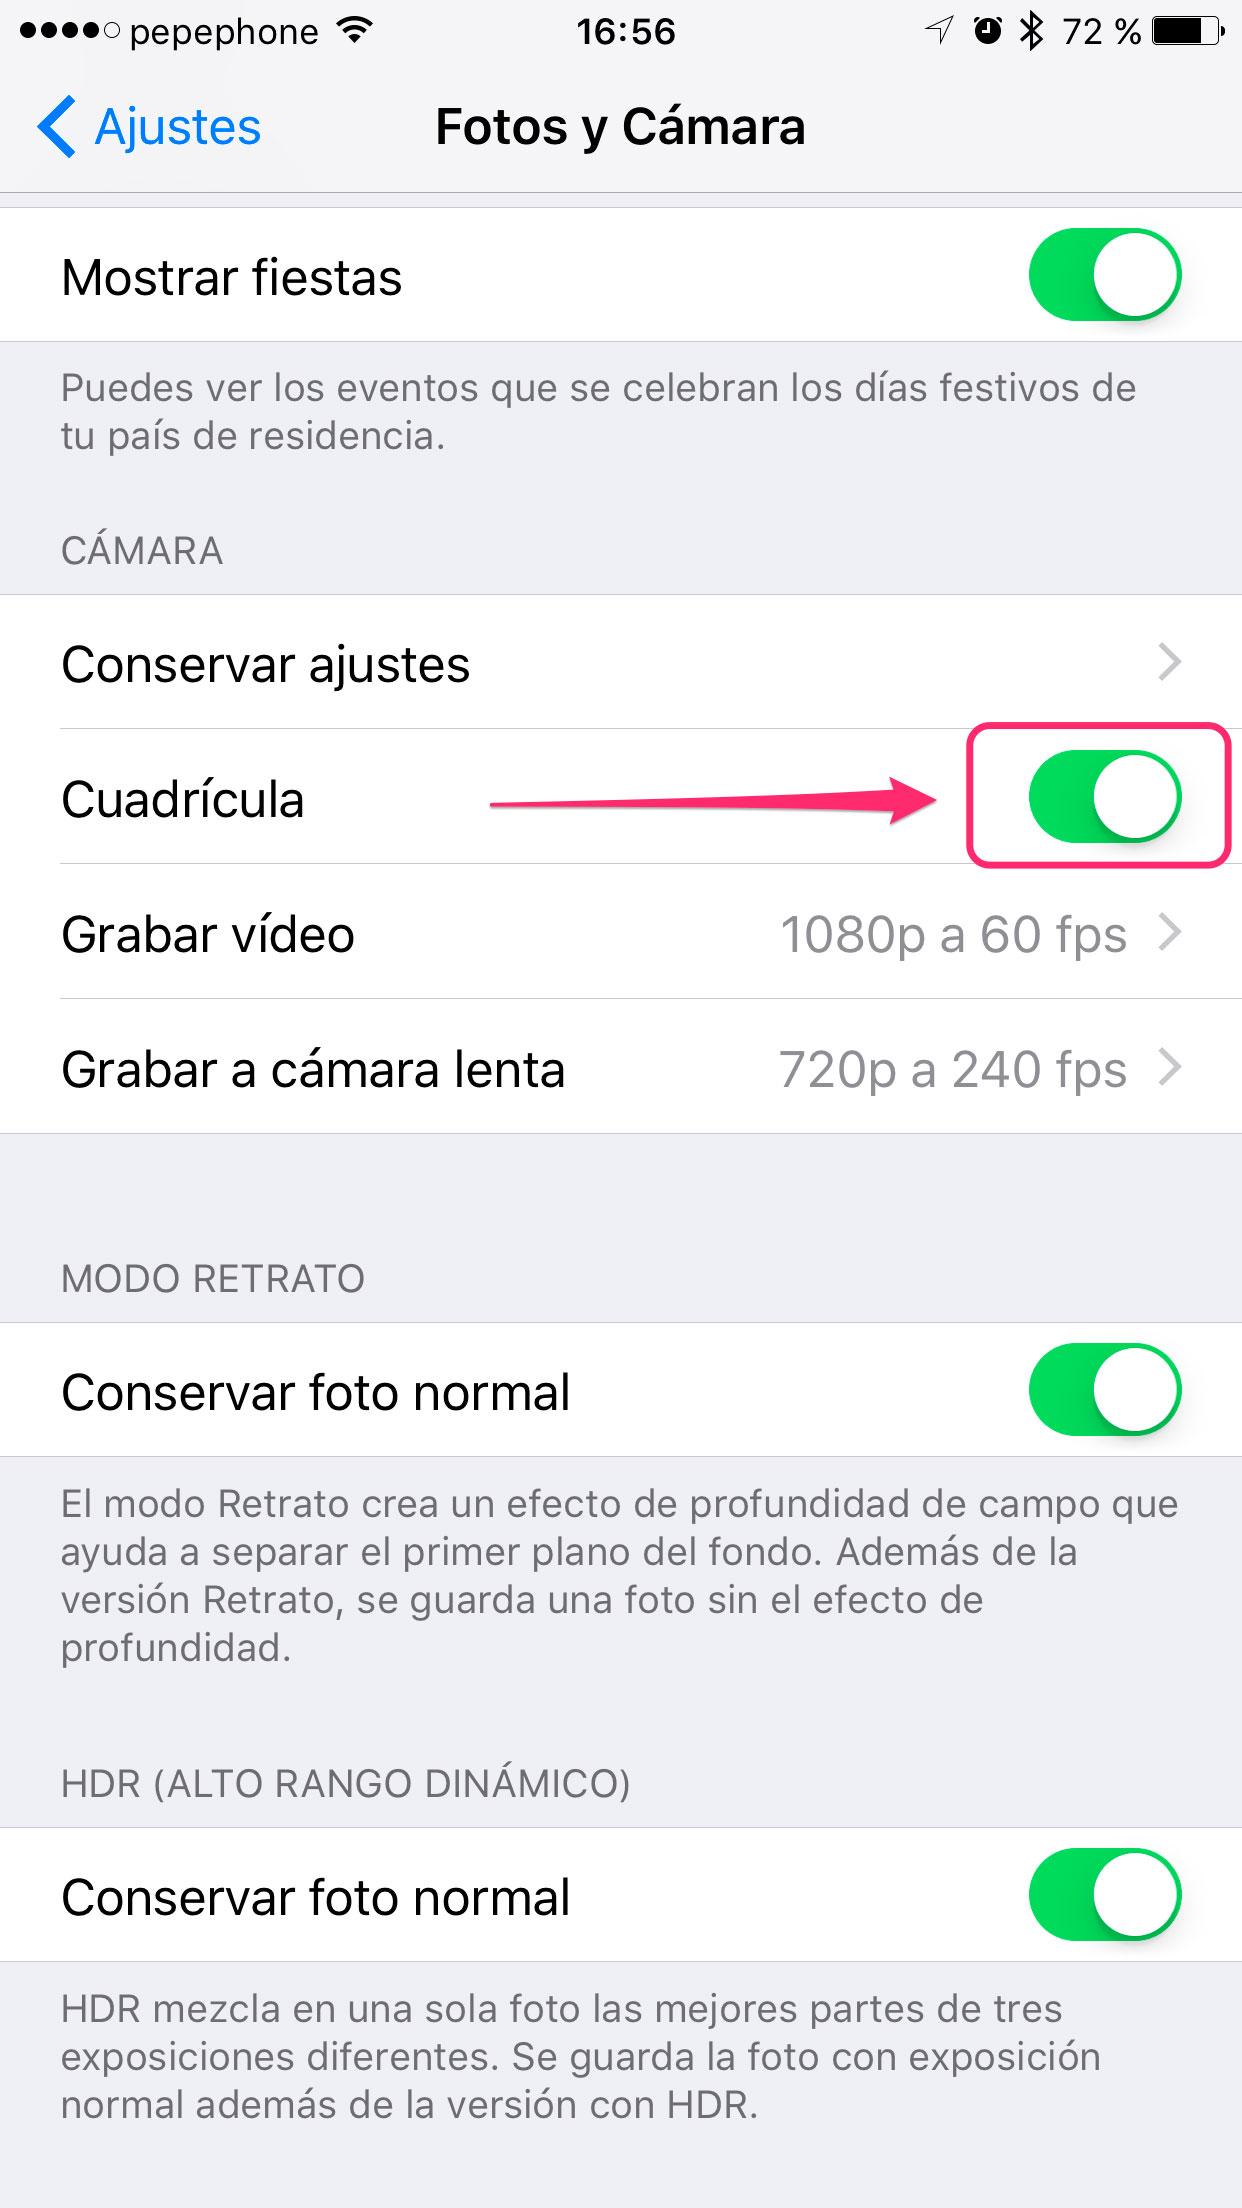 9 Trucos para grabar vídeo profesional con tu iPhone   iPhoneA2